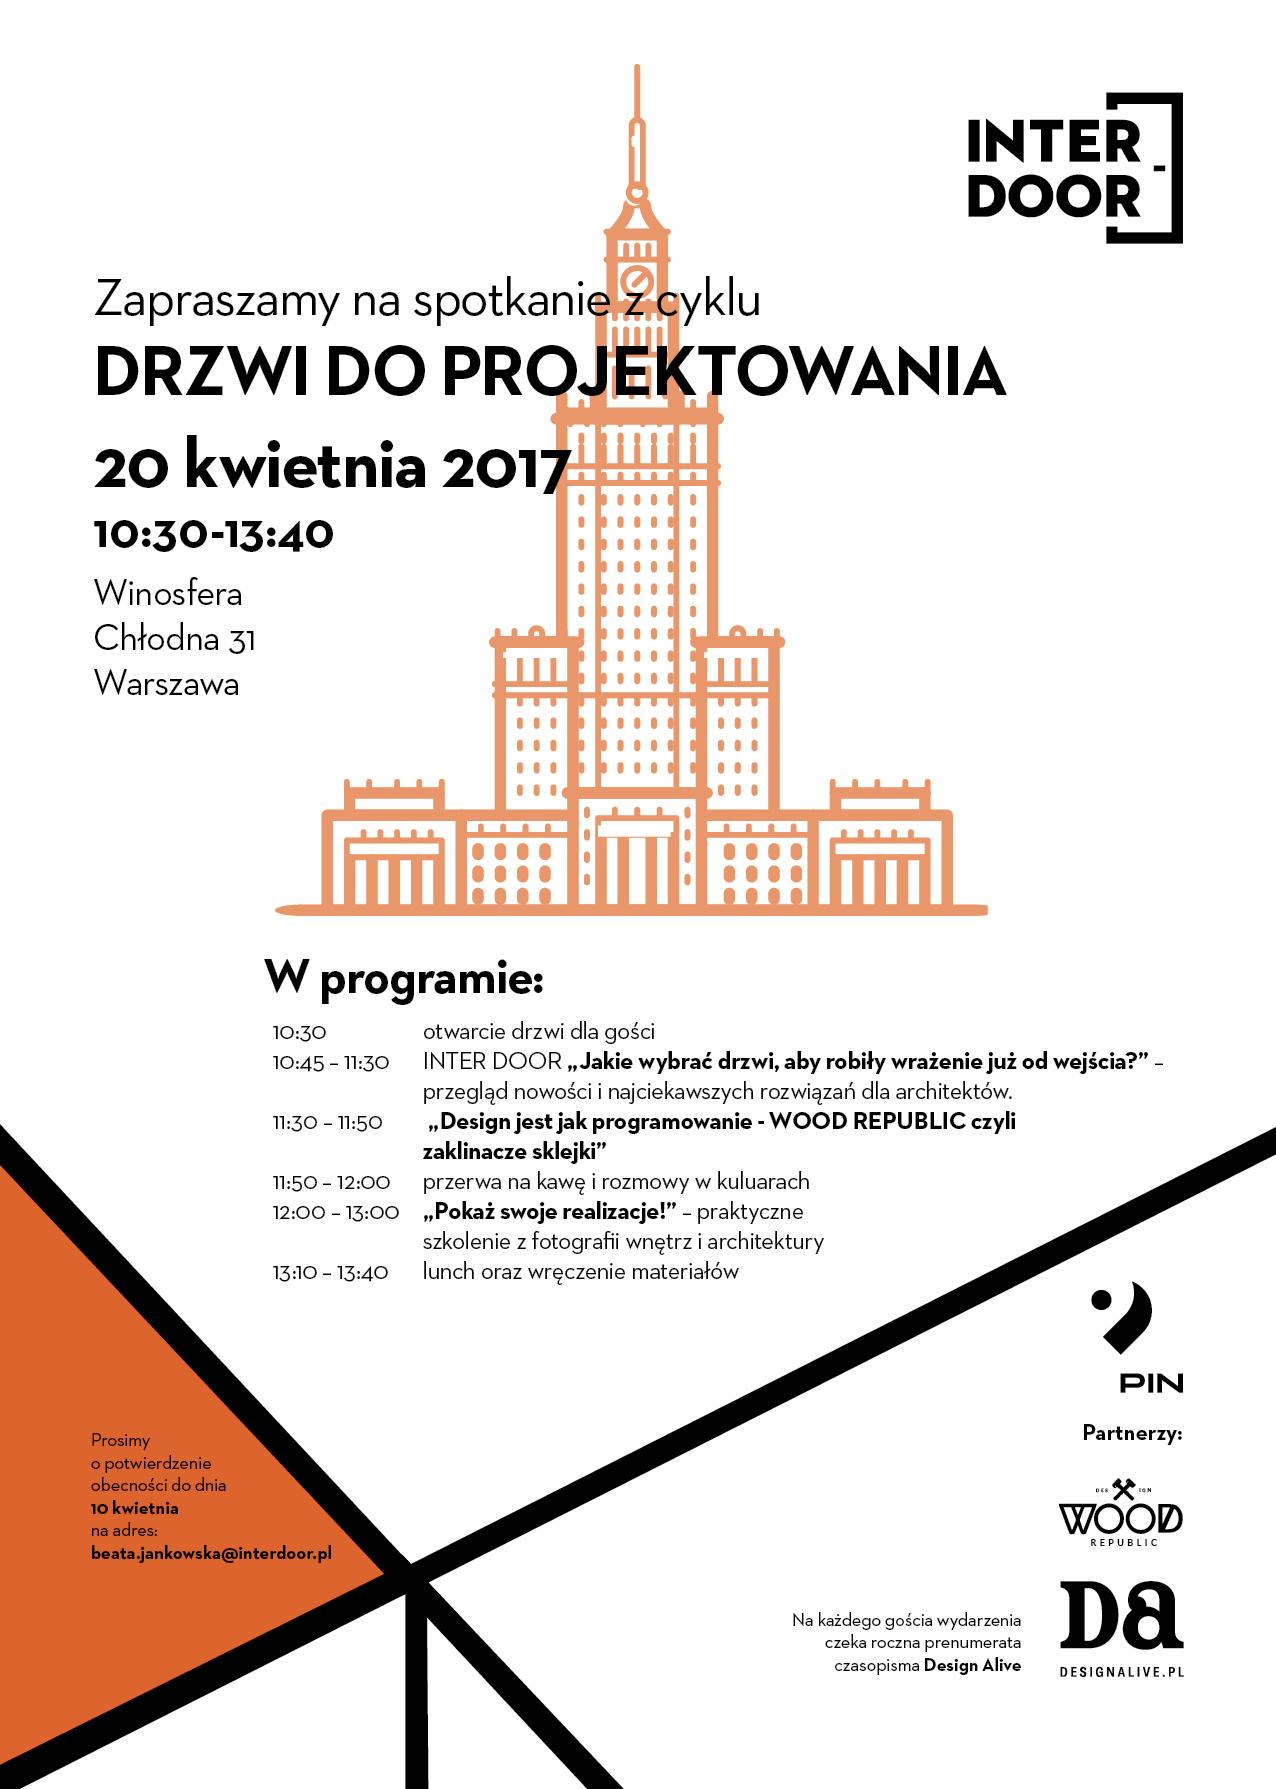 Spotkanie w Warszawie_INTER DOOR